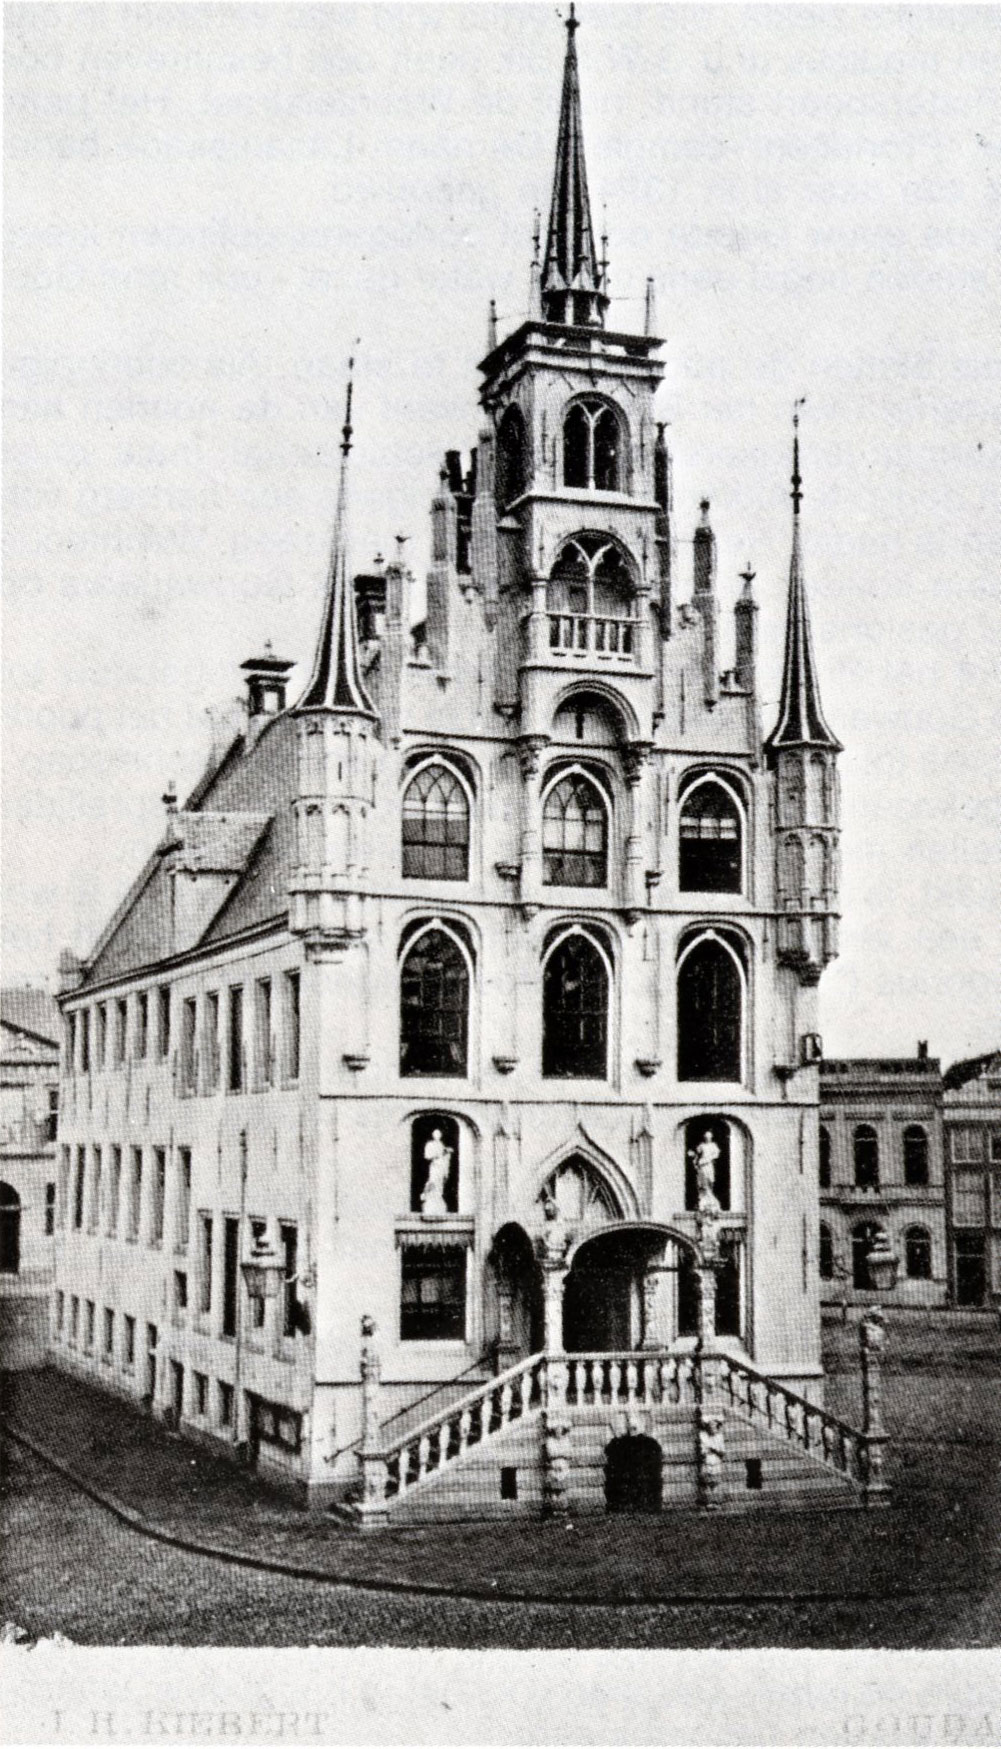 Jan en Jan werkten aan het Stadhuis van Gouda.